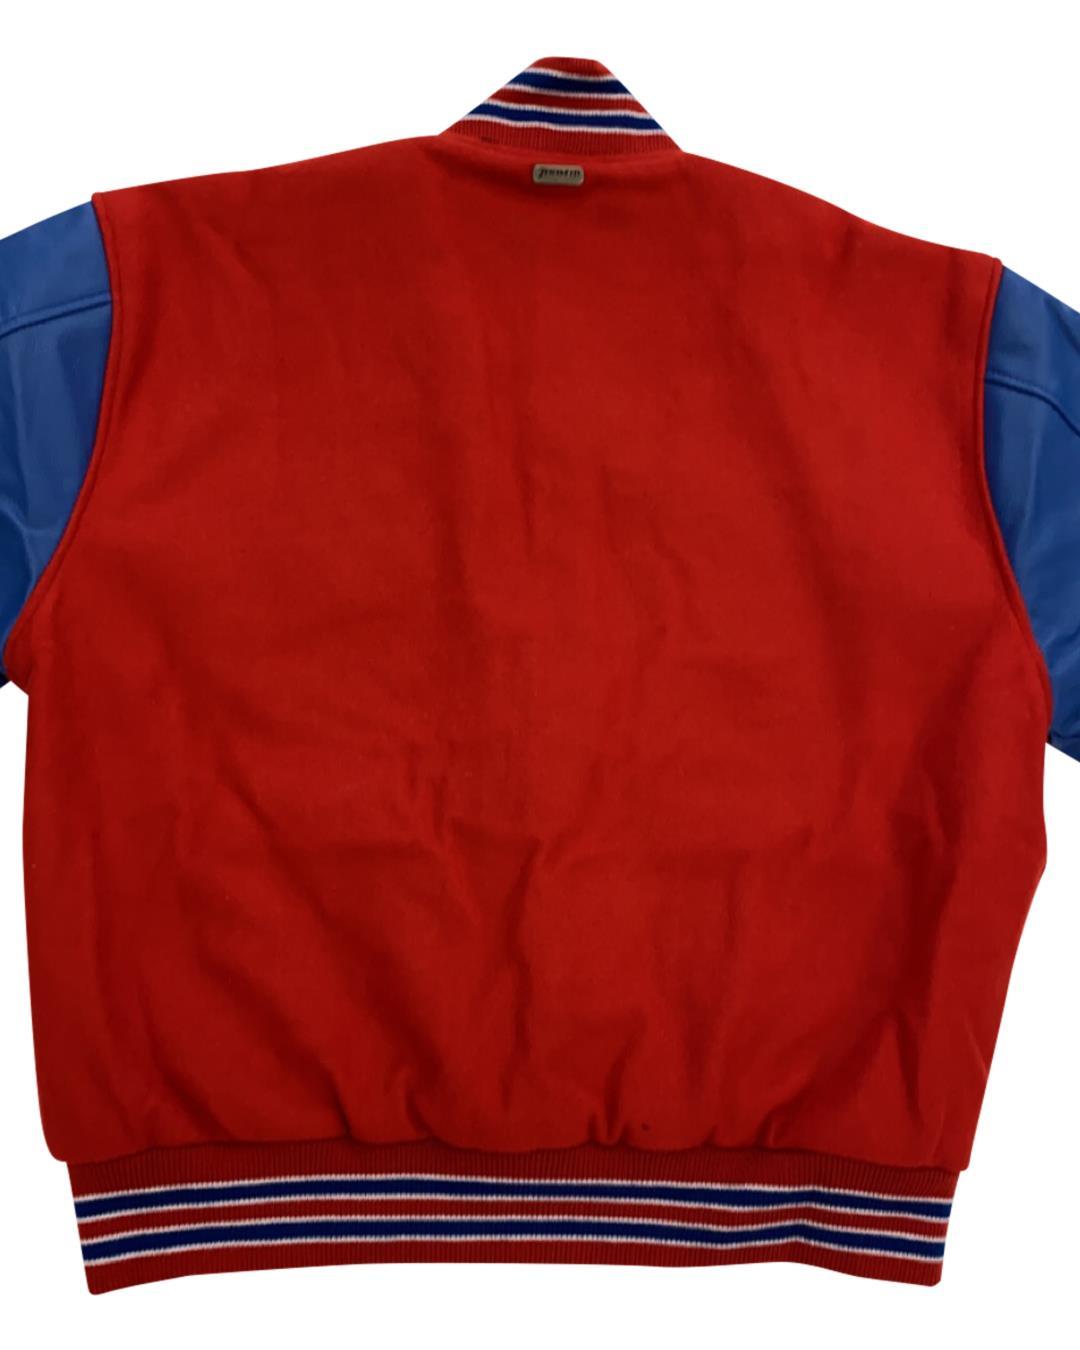 East Rankin Academy Letterman Jacket, Pelahatchie MS - Back